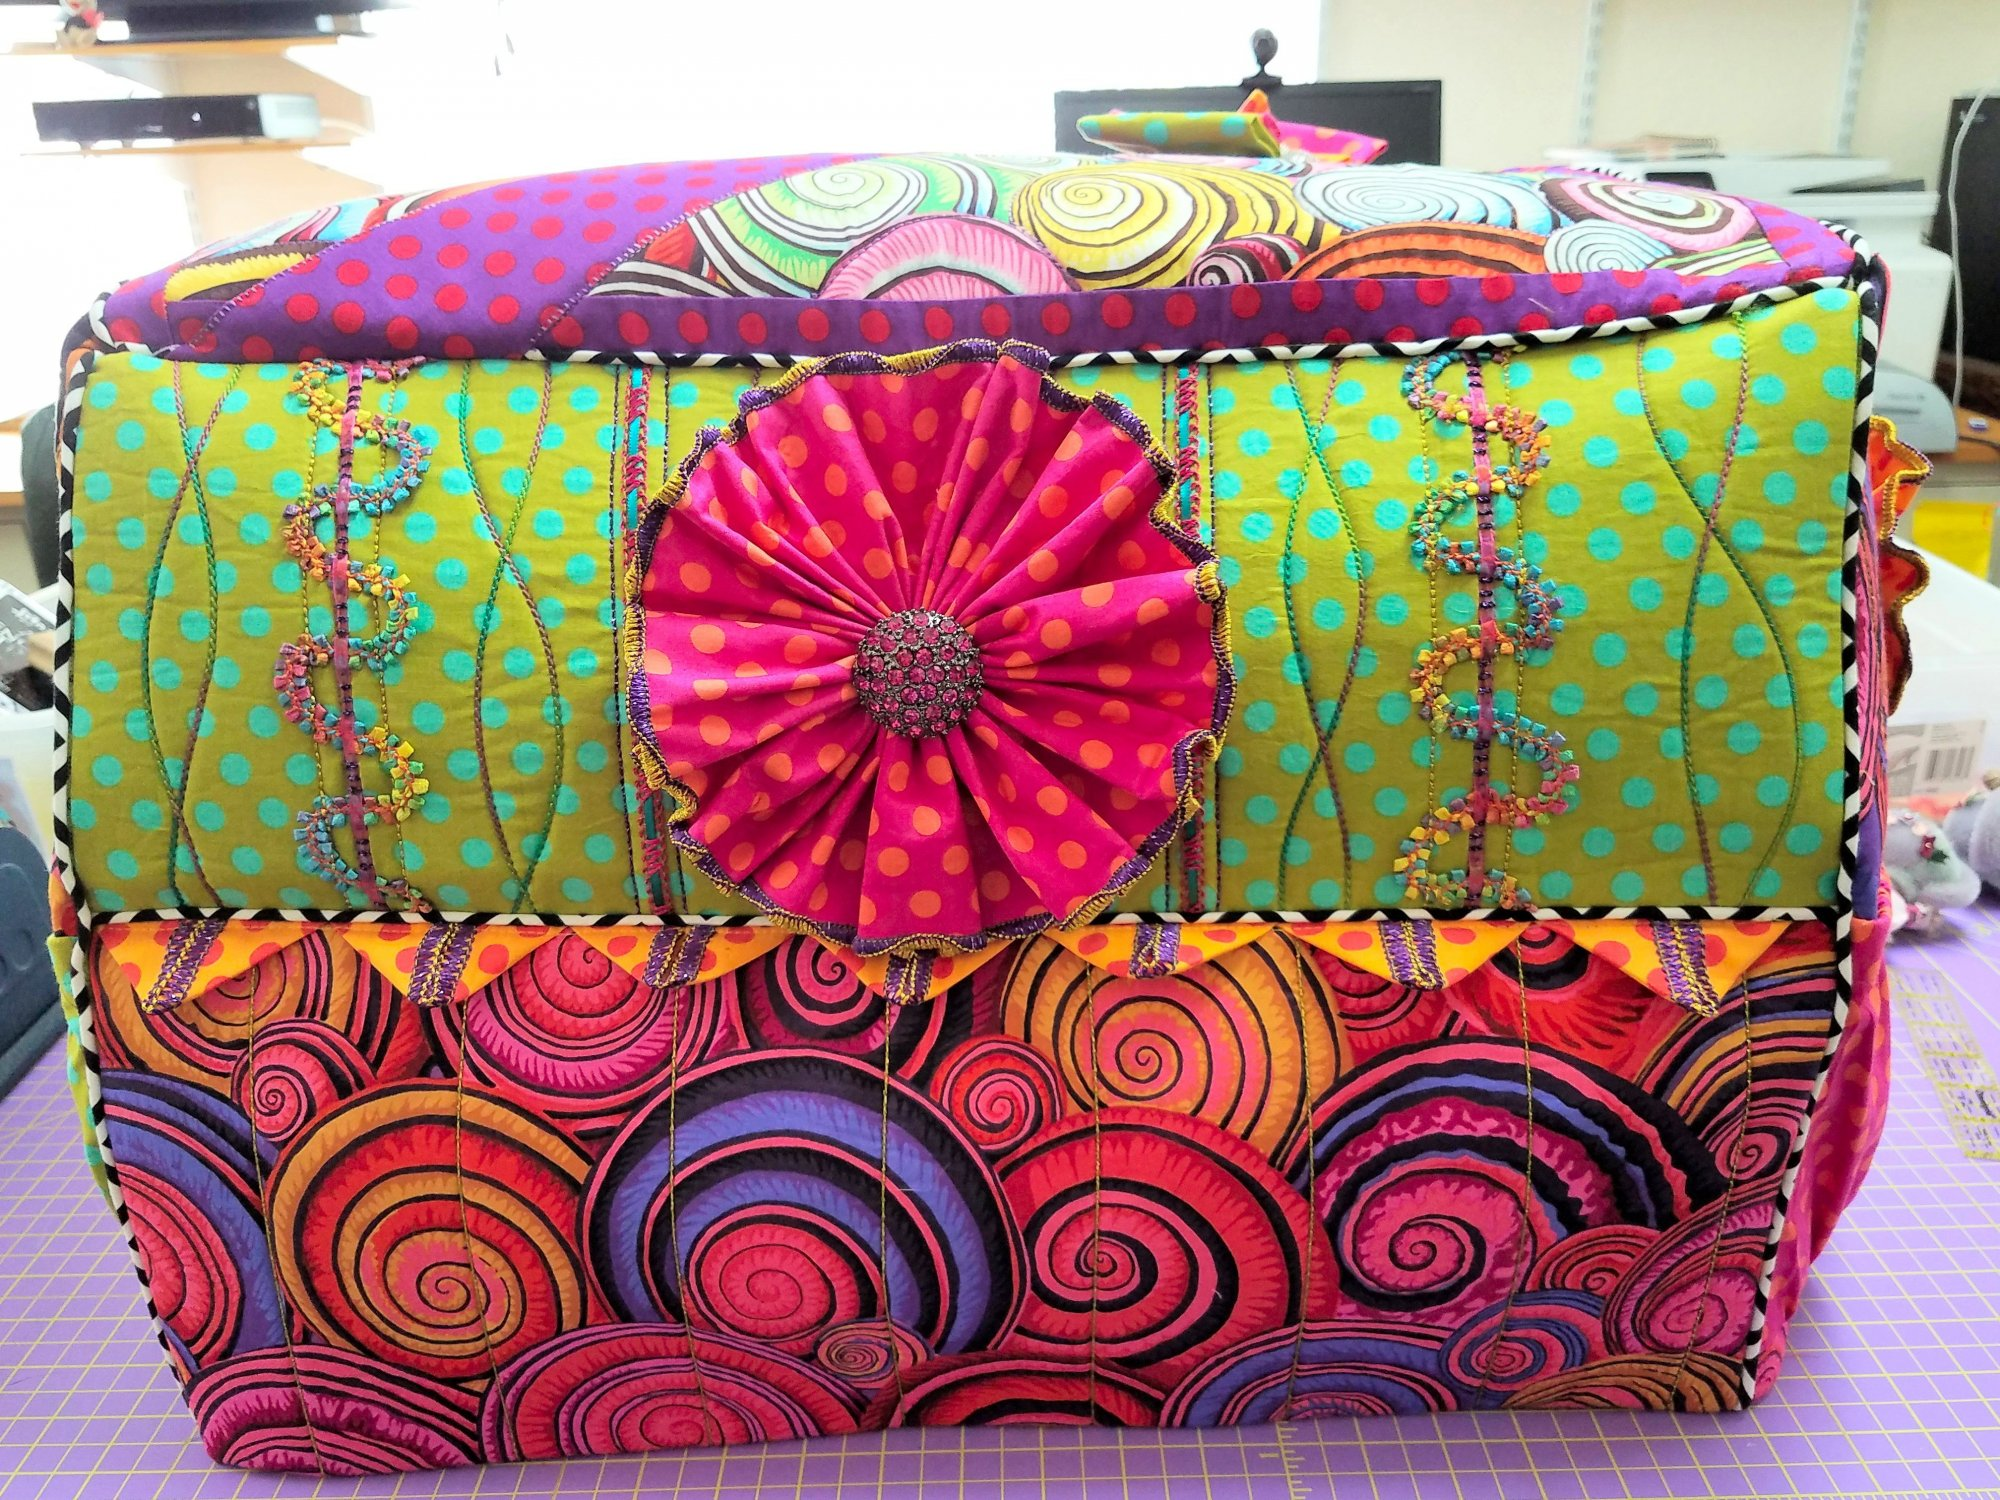 Pattern - Deb Canham Studio Small Serger Cover